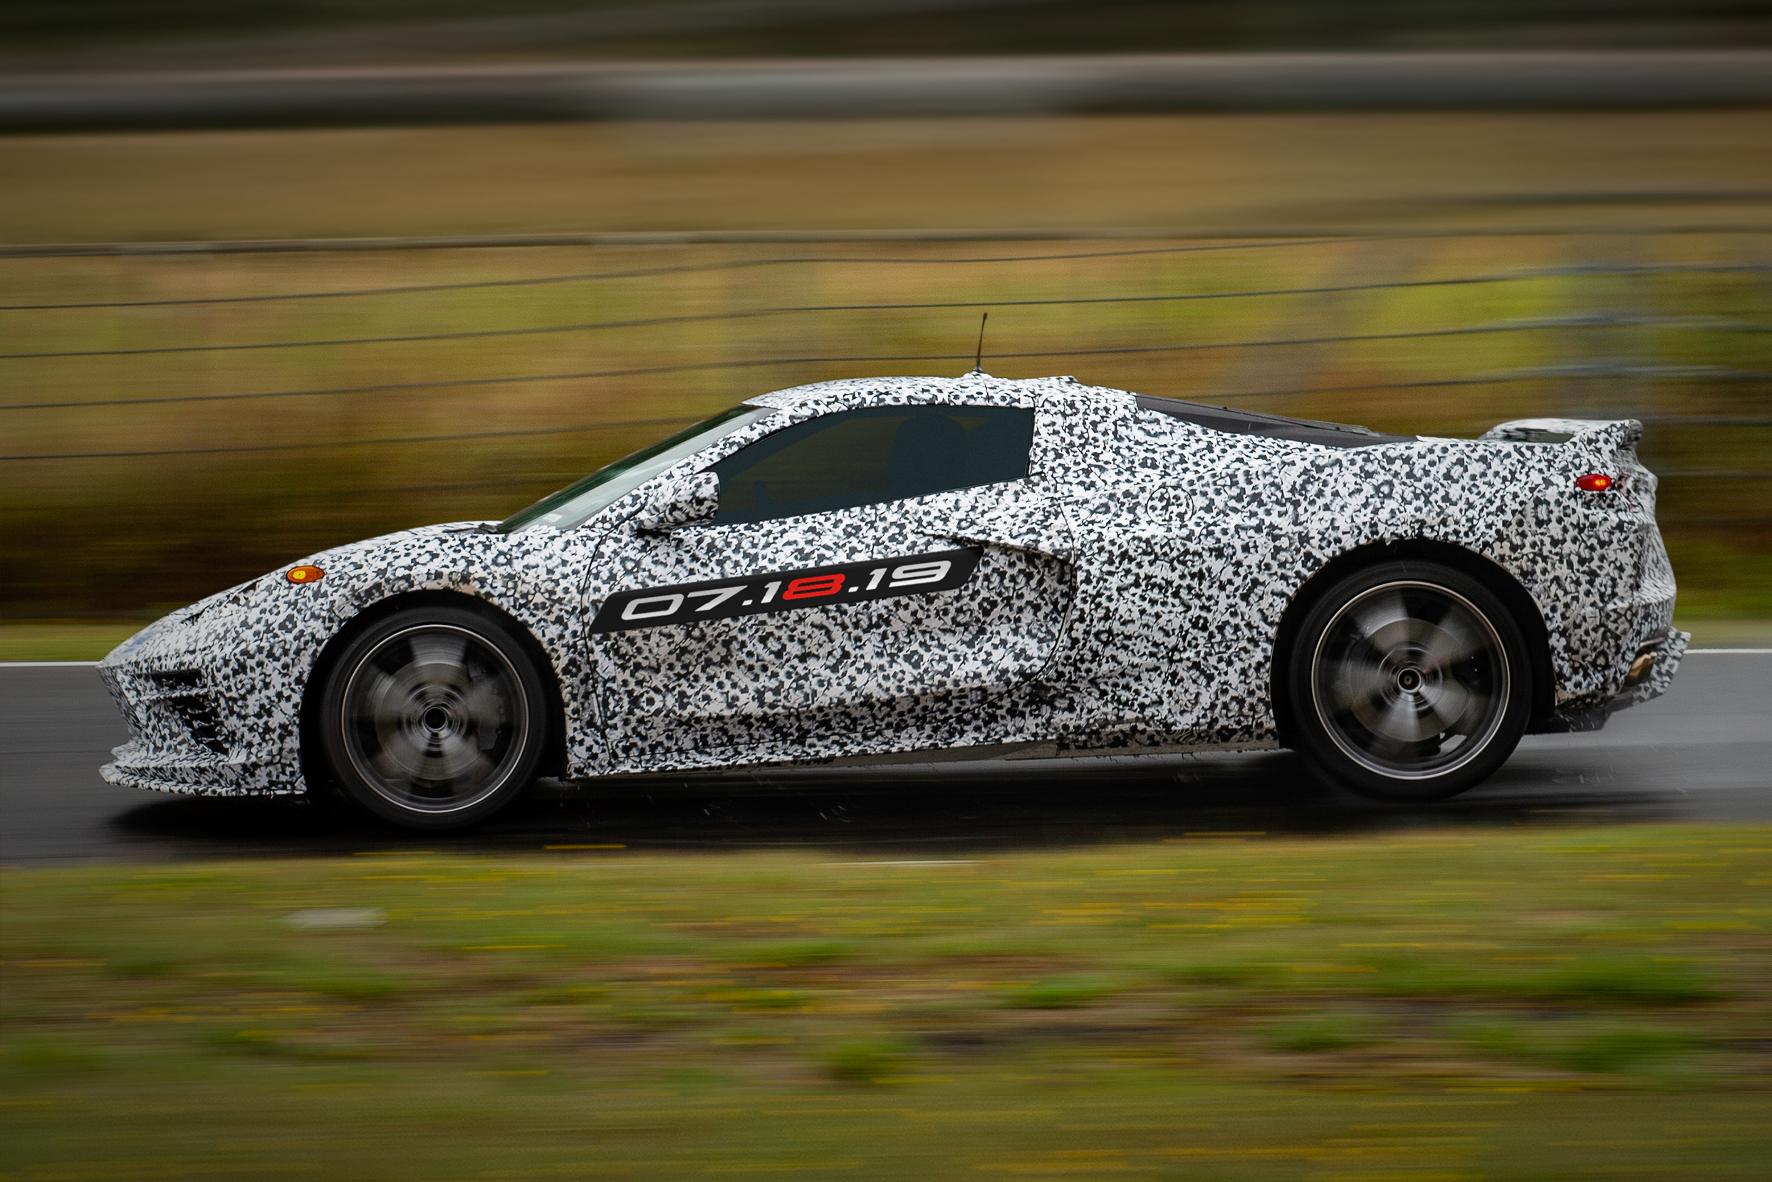 mid Groß-Gerau - Neues aus dem Hause GM: die künftige Corvette Stingray. GM Company